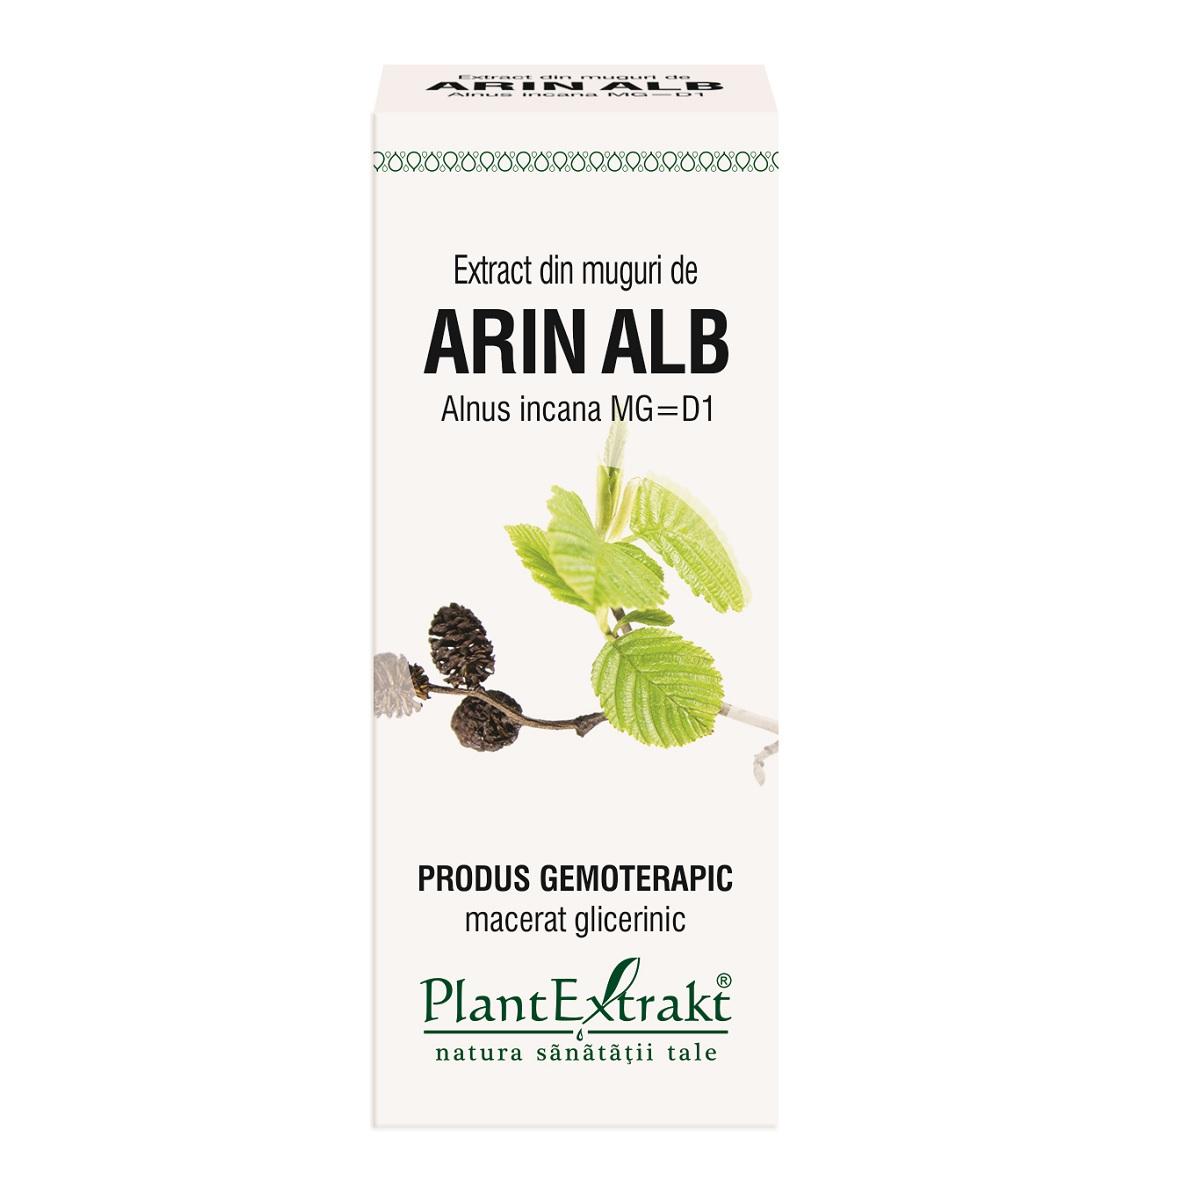 Extract din muguri de Arin Alb, 50 ml, Plant Extrakt